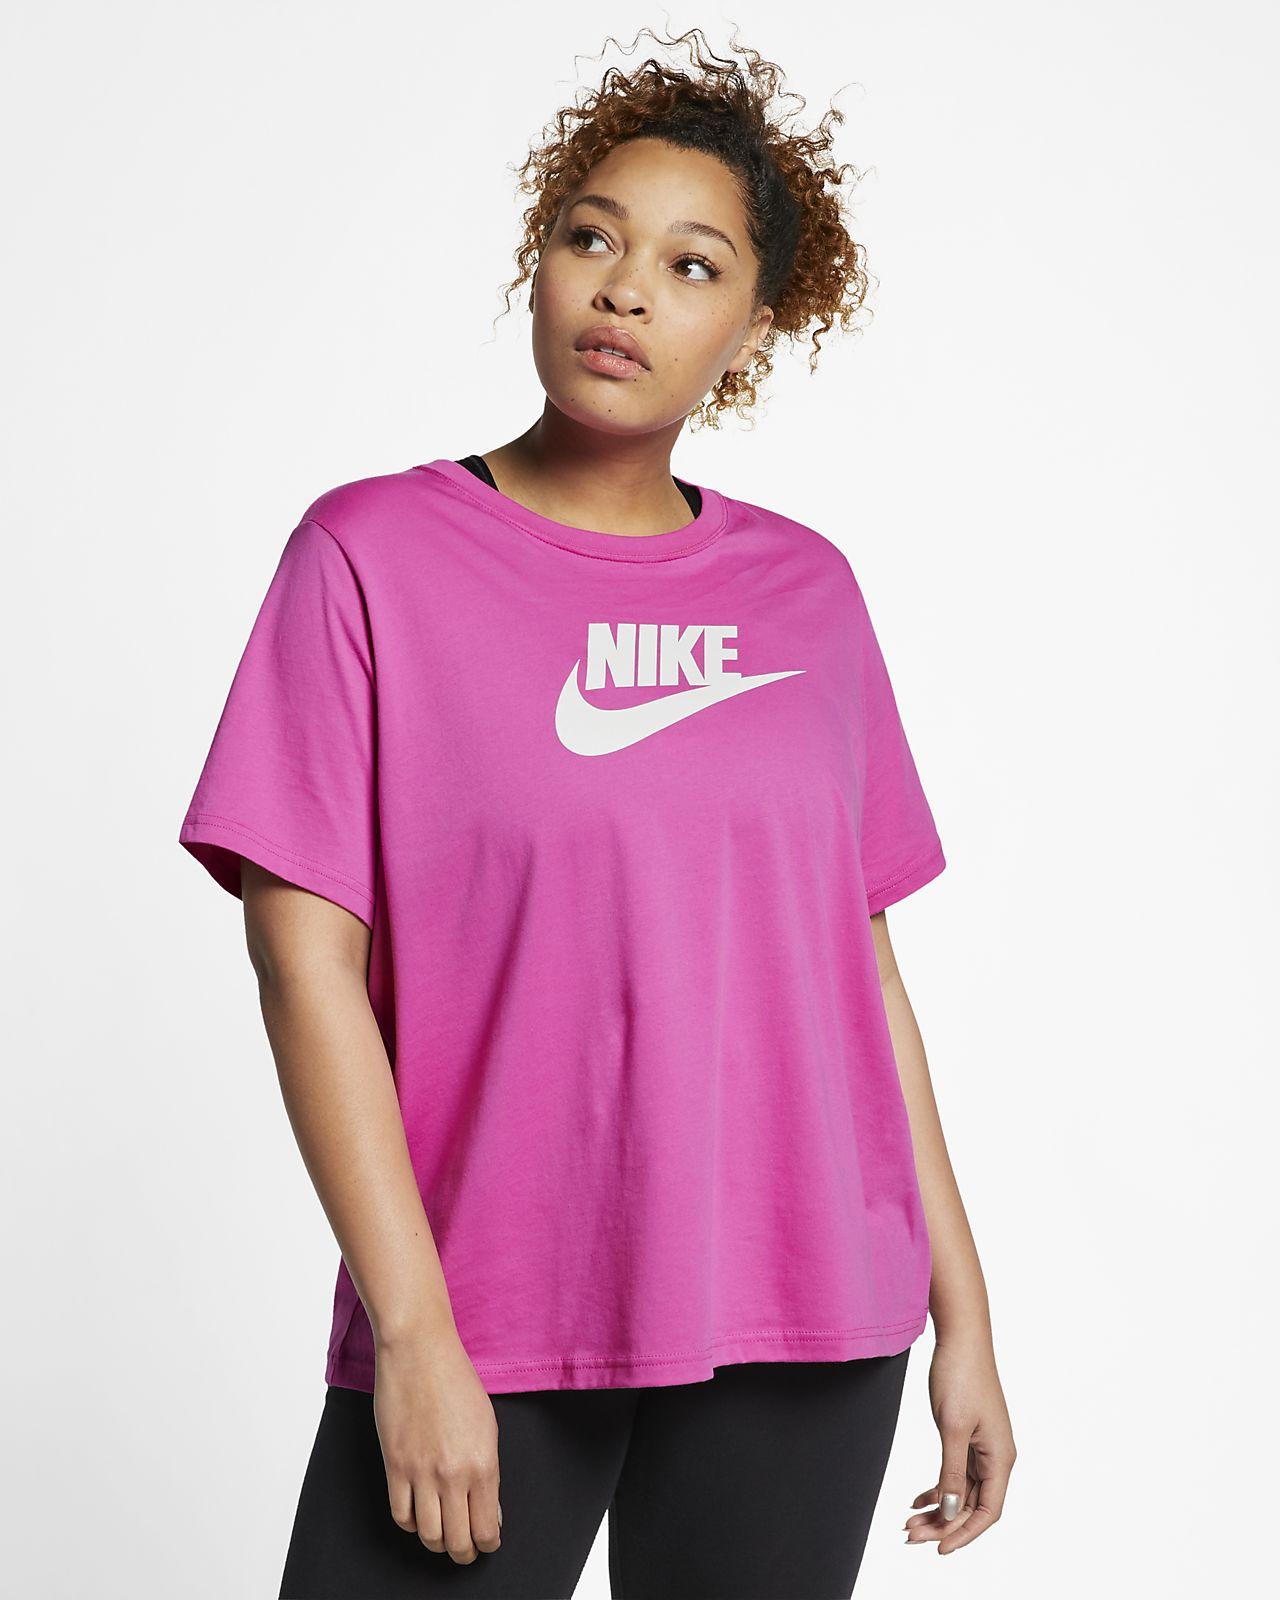 1c8d1c85d Nike Sportswear Essential Women's T-Shirt (Plus Size). Nike.com